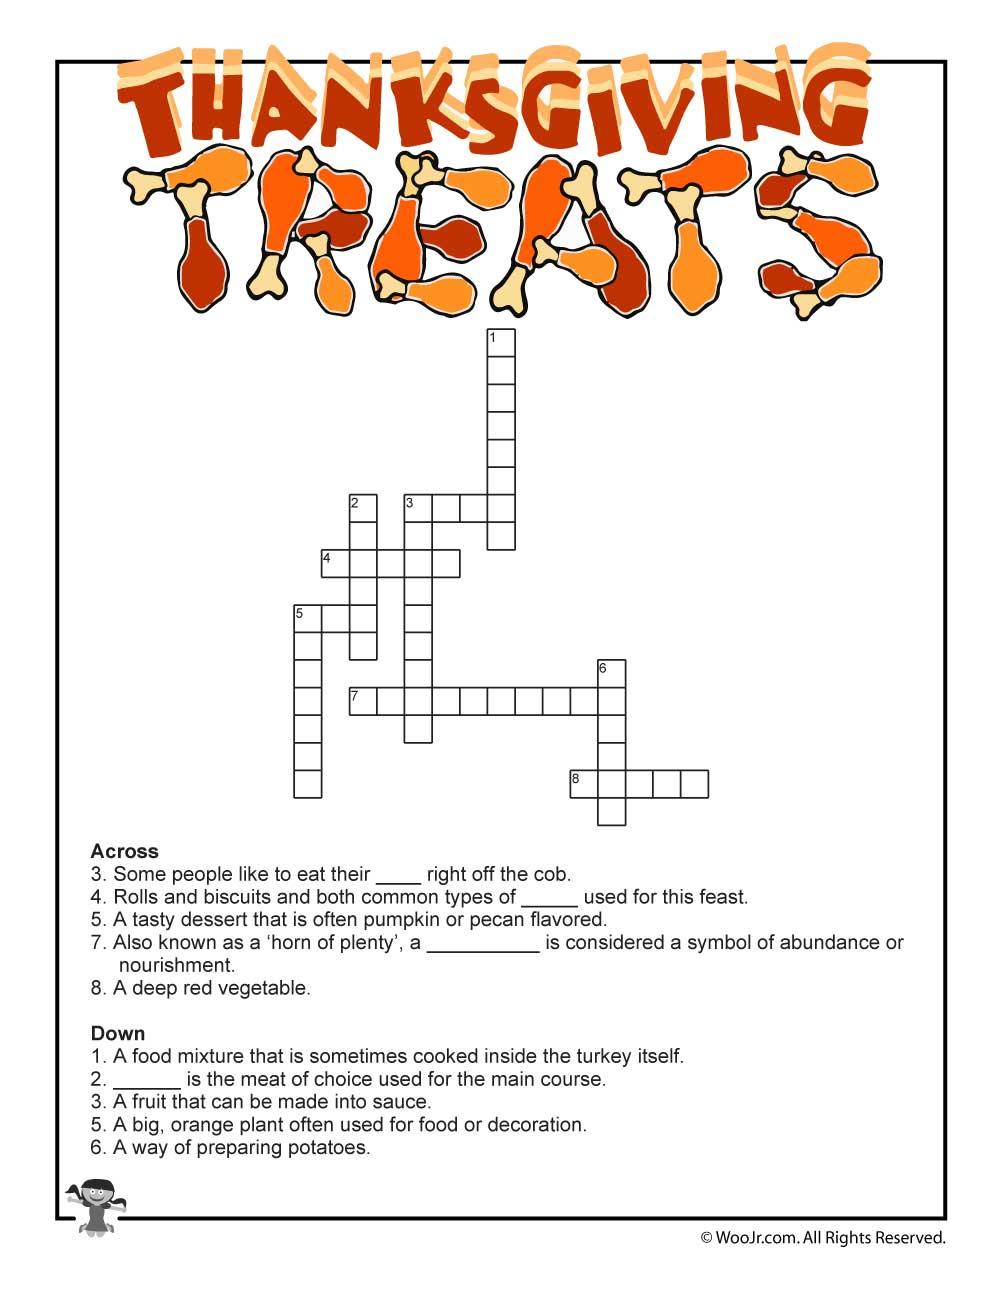 Thanksgiving Crossword Puzzle | Woo! Jr. Kids Activities - Printable Thanksgiving Crossword